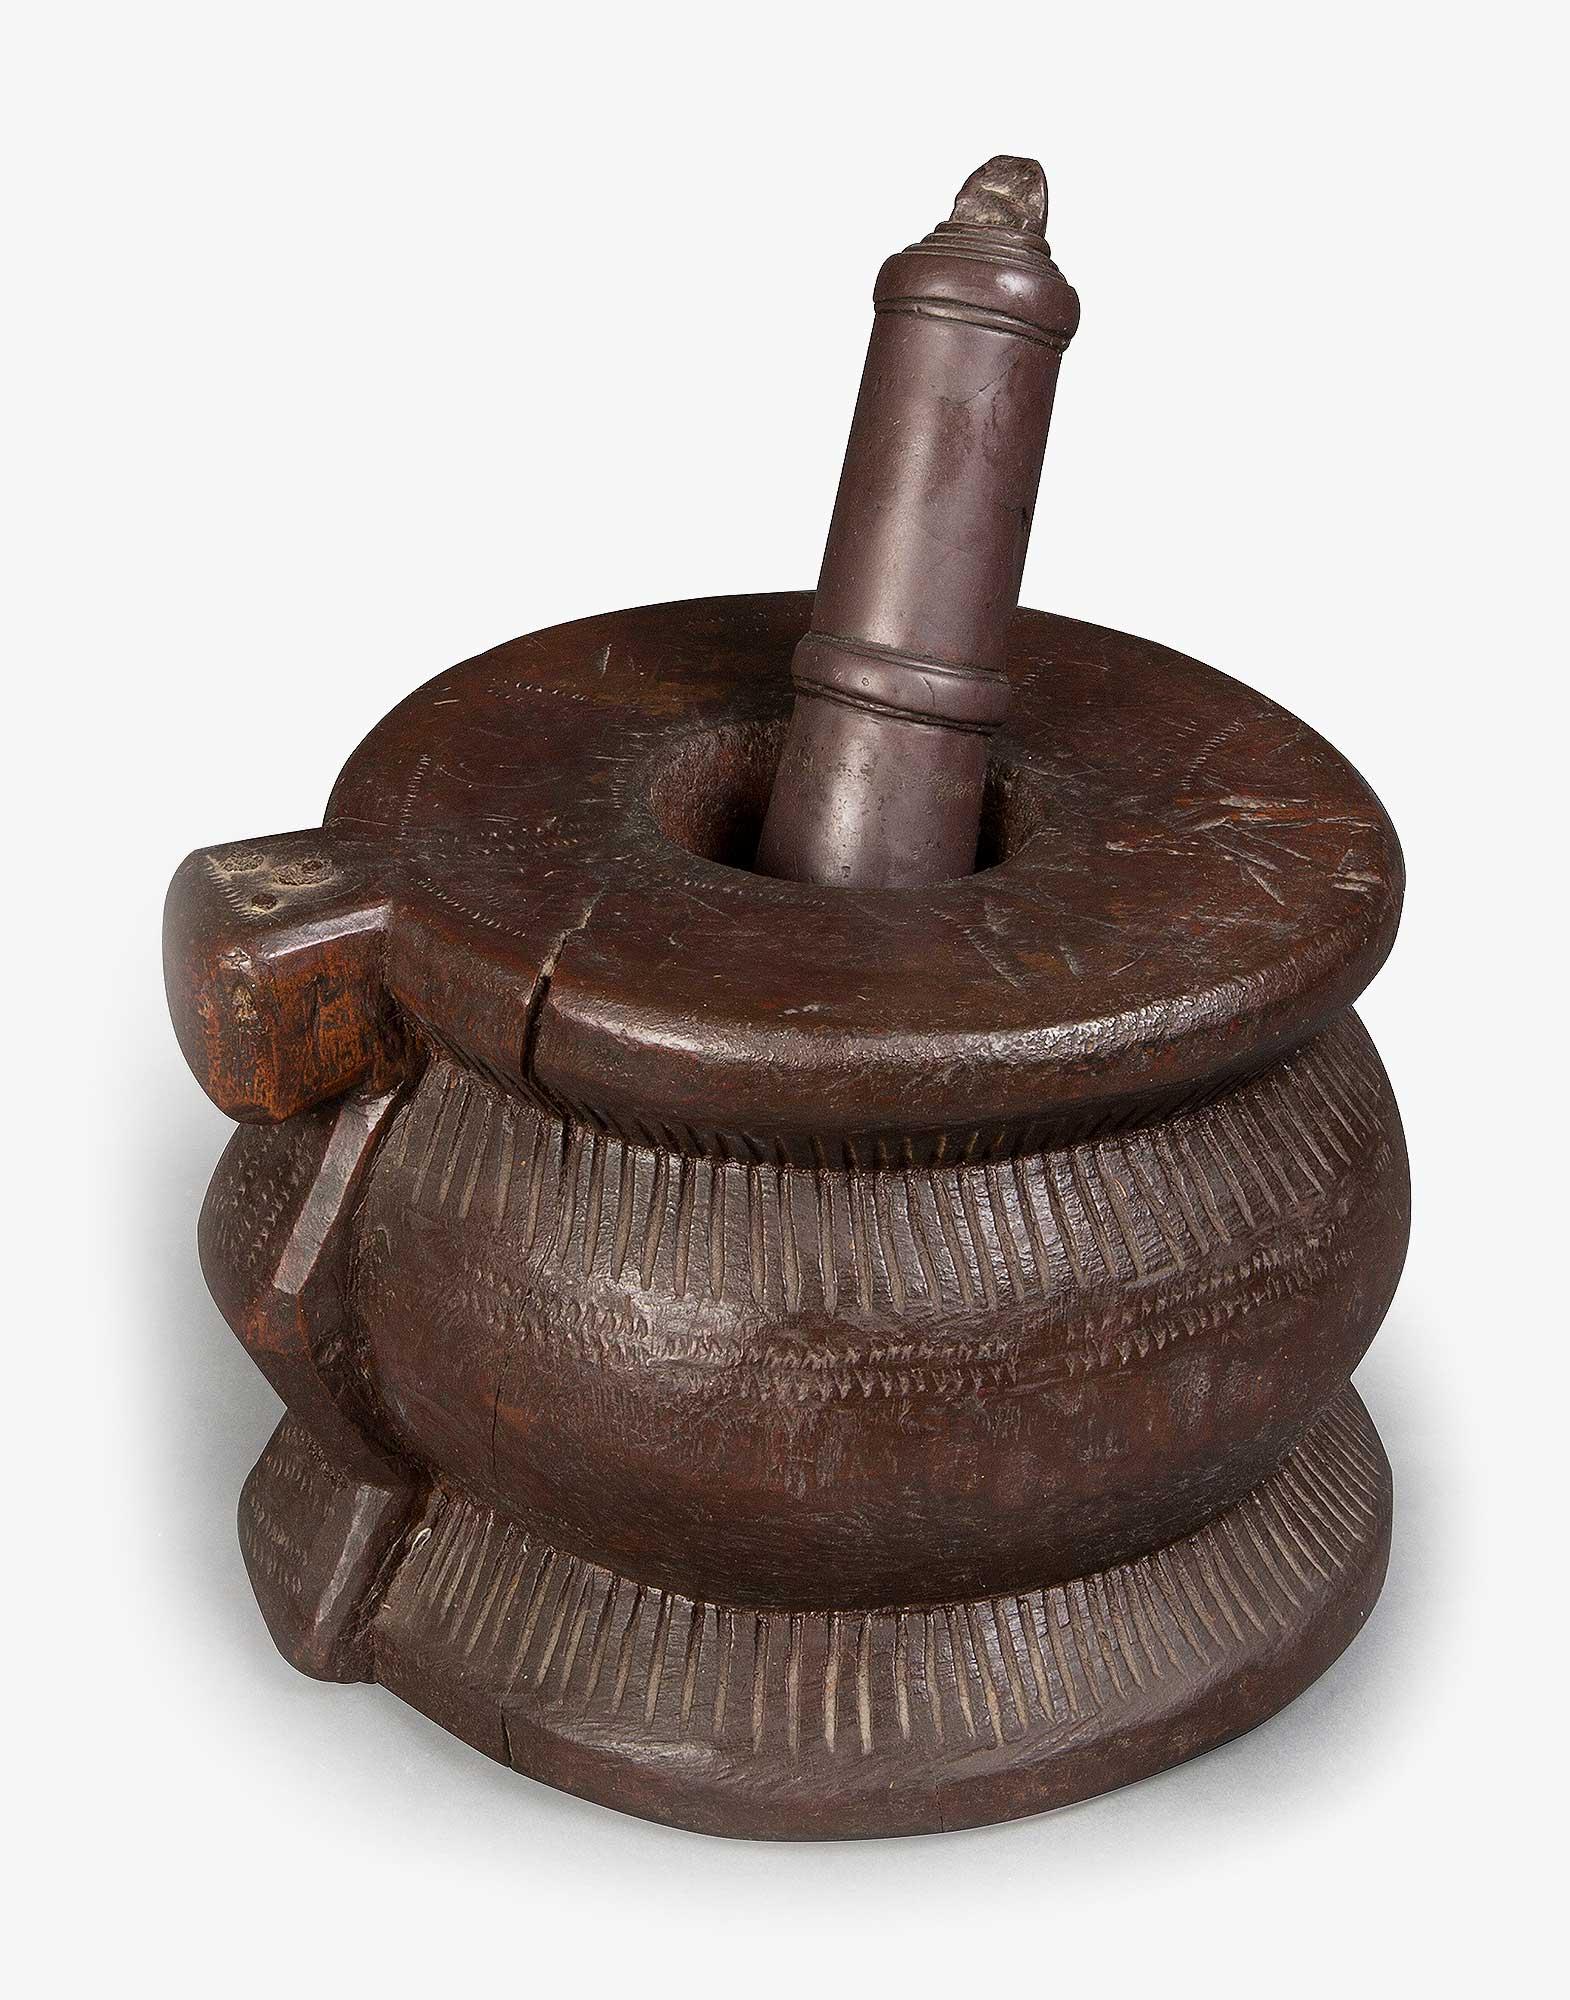 Antique Handmade Wooden Mortar